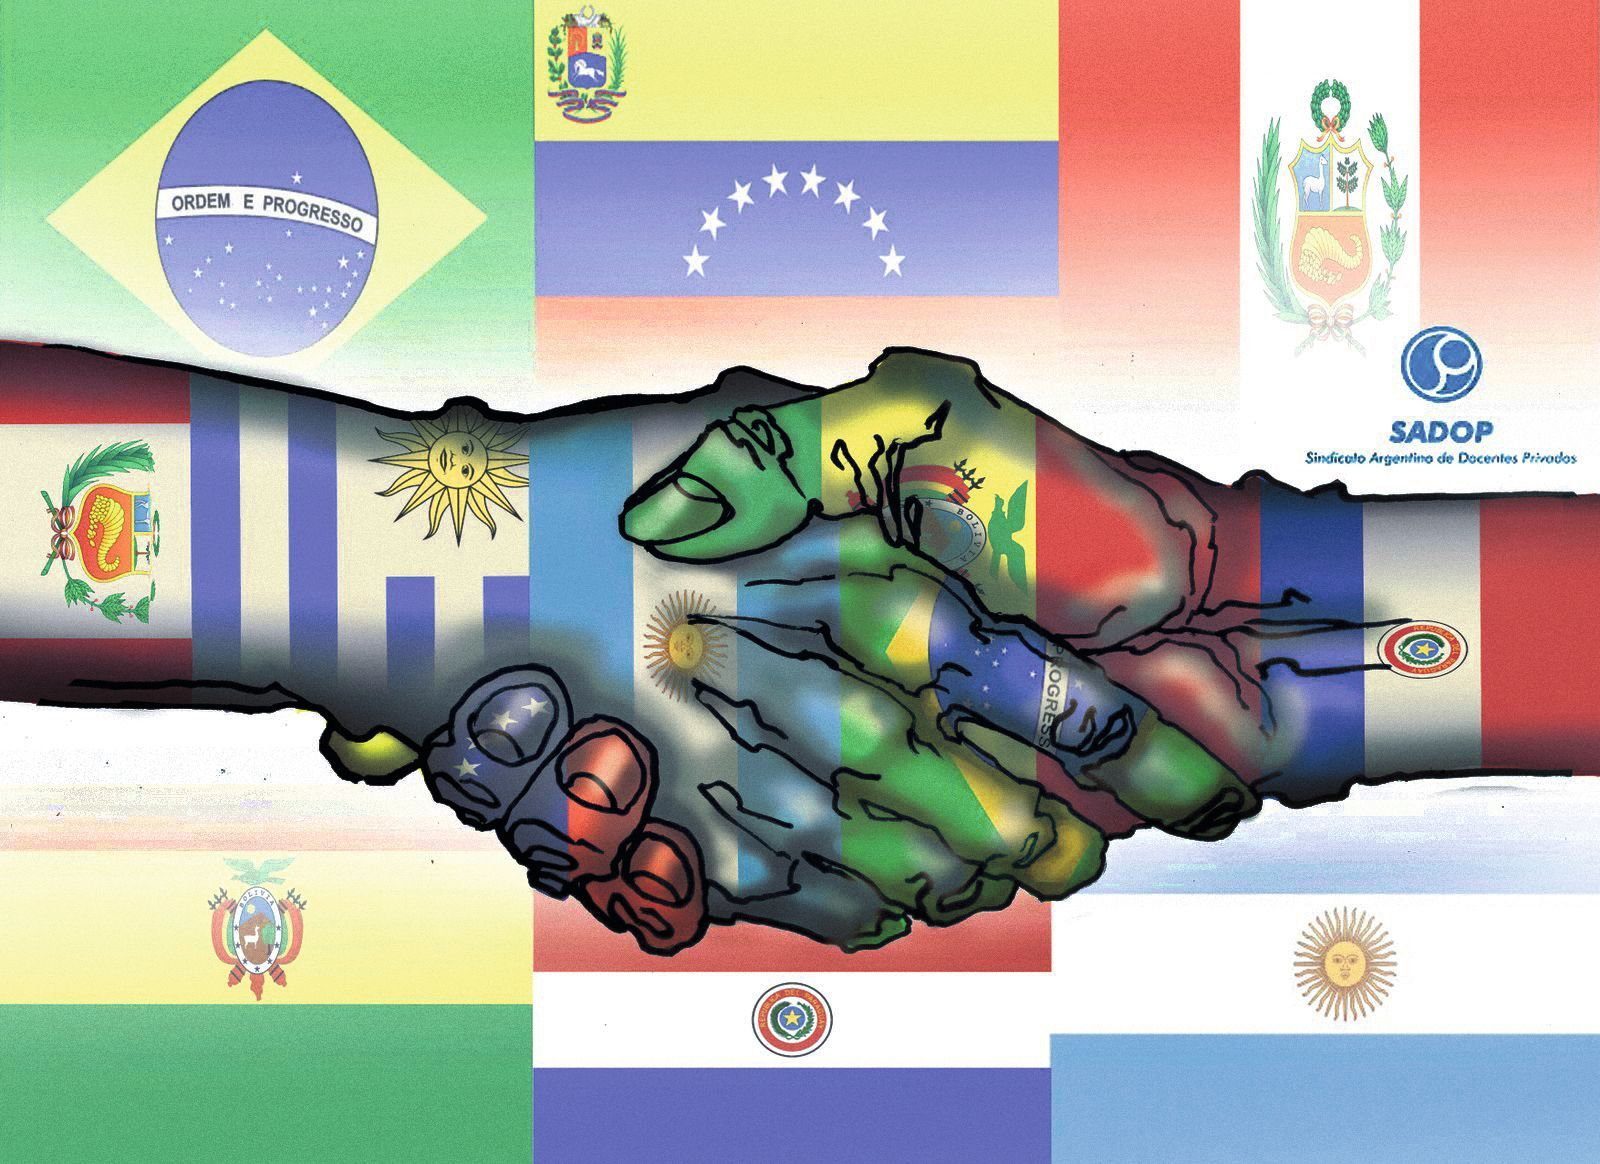 Sindicato argentino de Docentes privados, 04/03/2013.